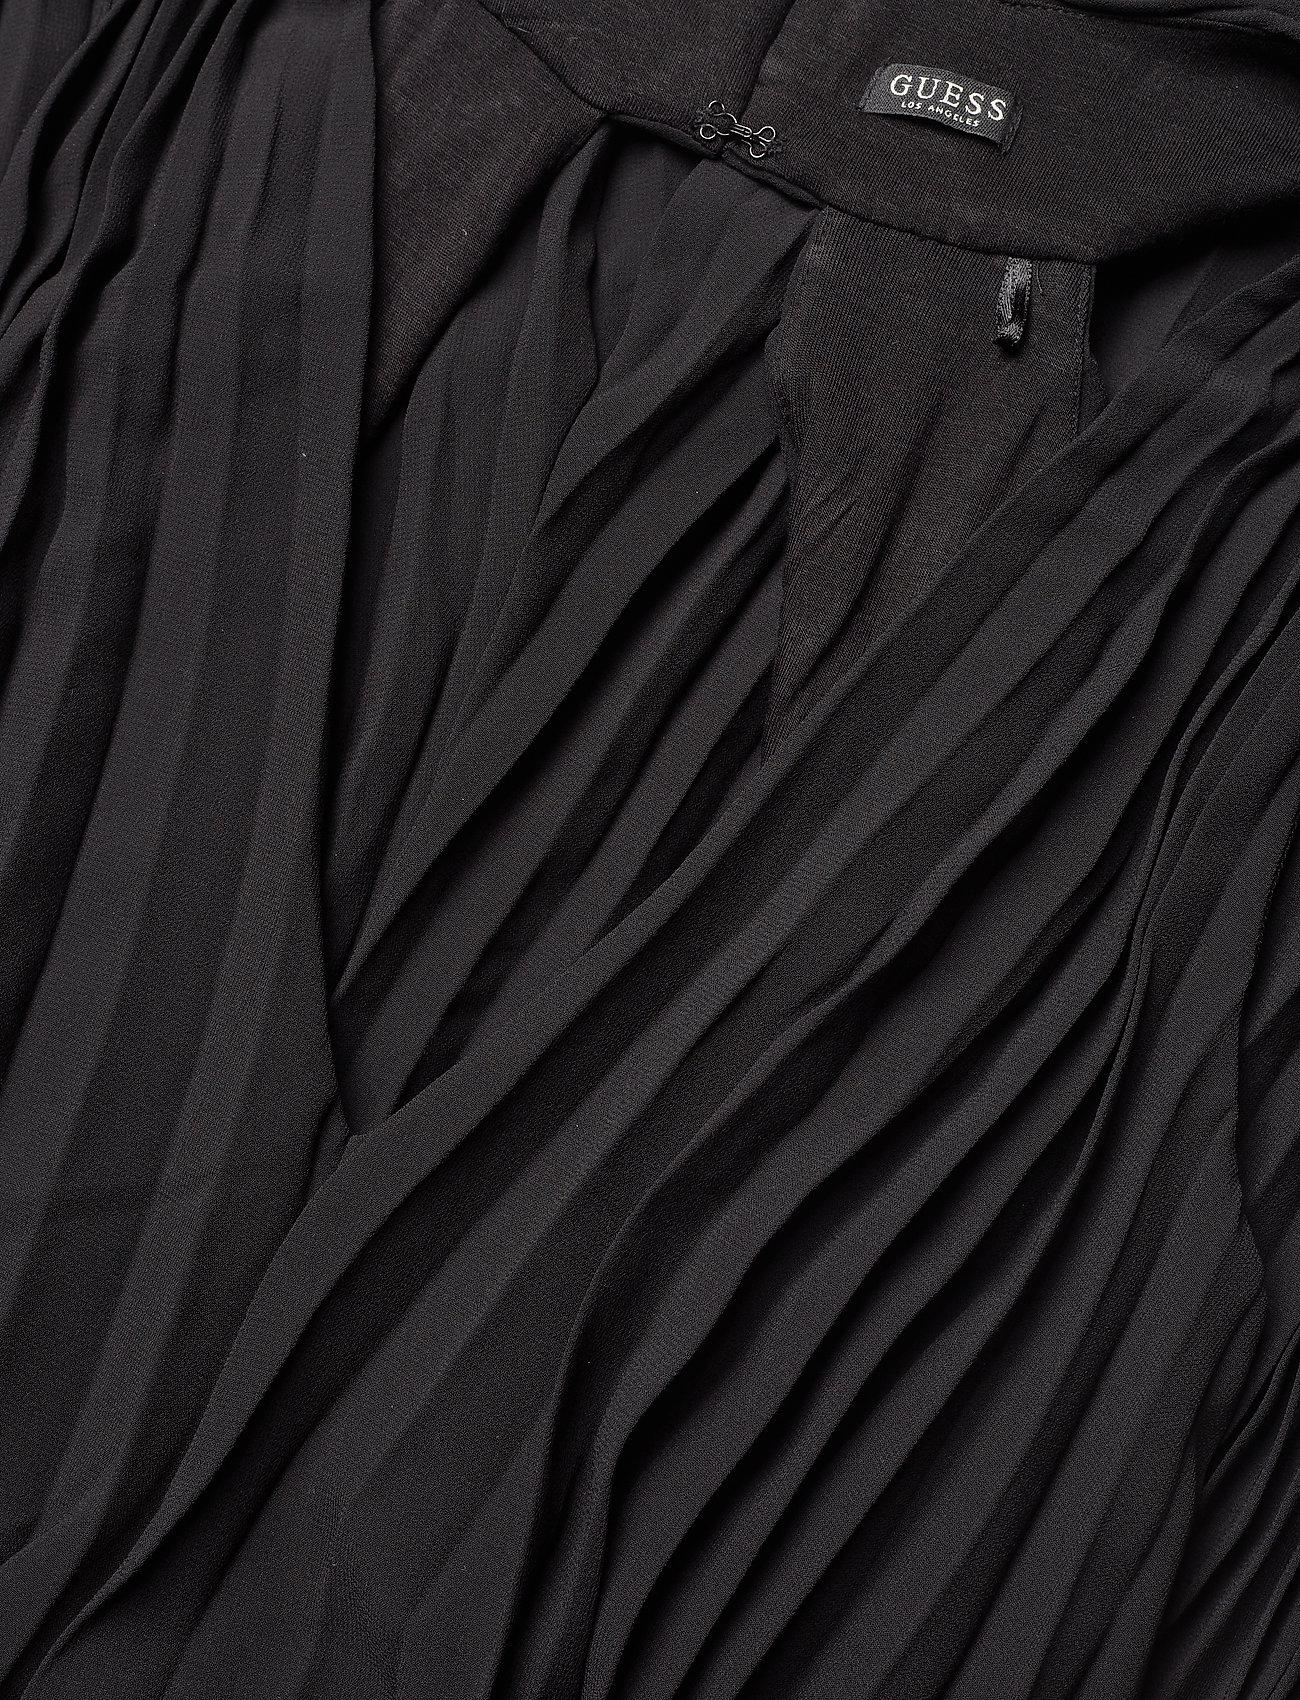 Patty Black A996Guess Patty Black Overalljet Jeans Overalljet IYbf7y6vg